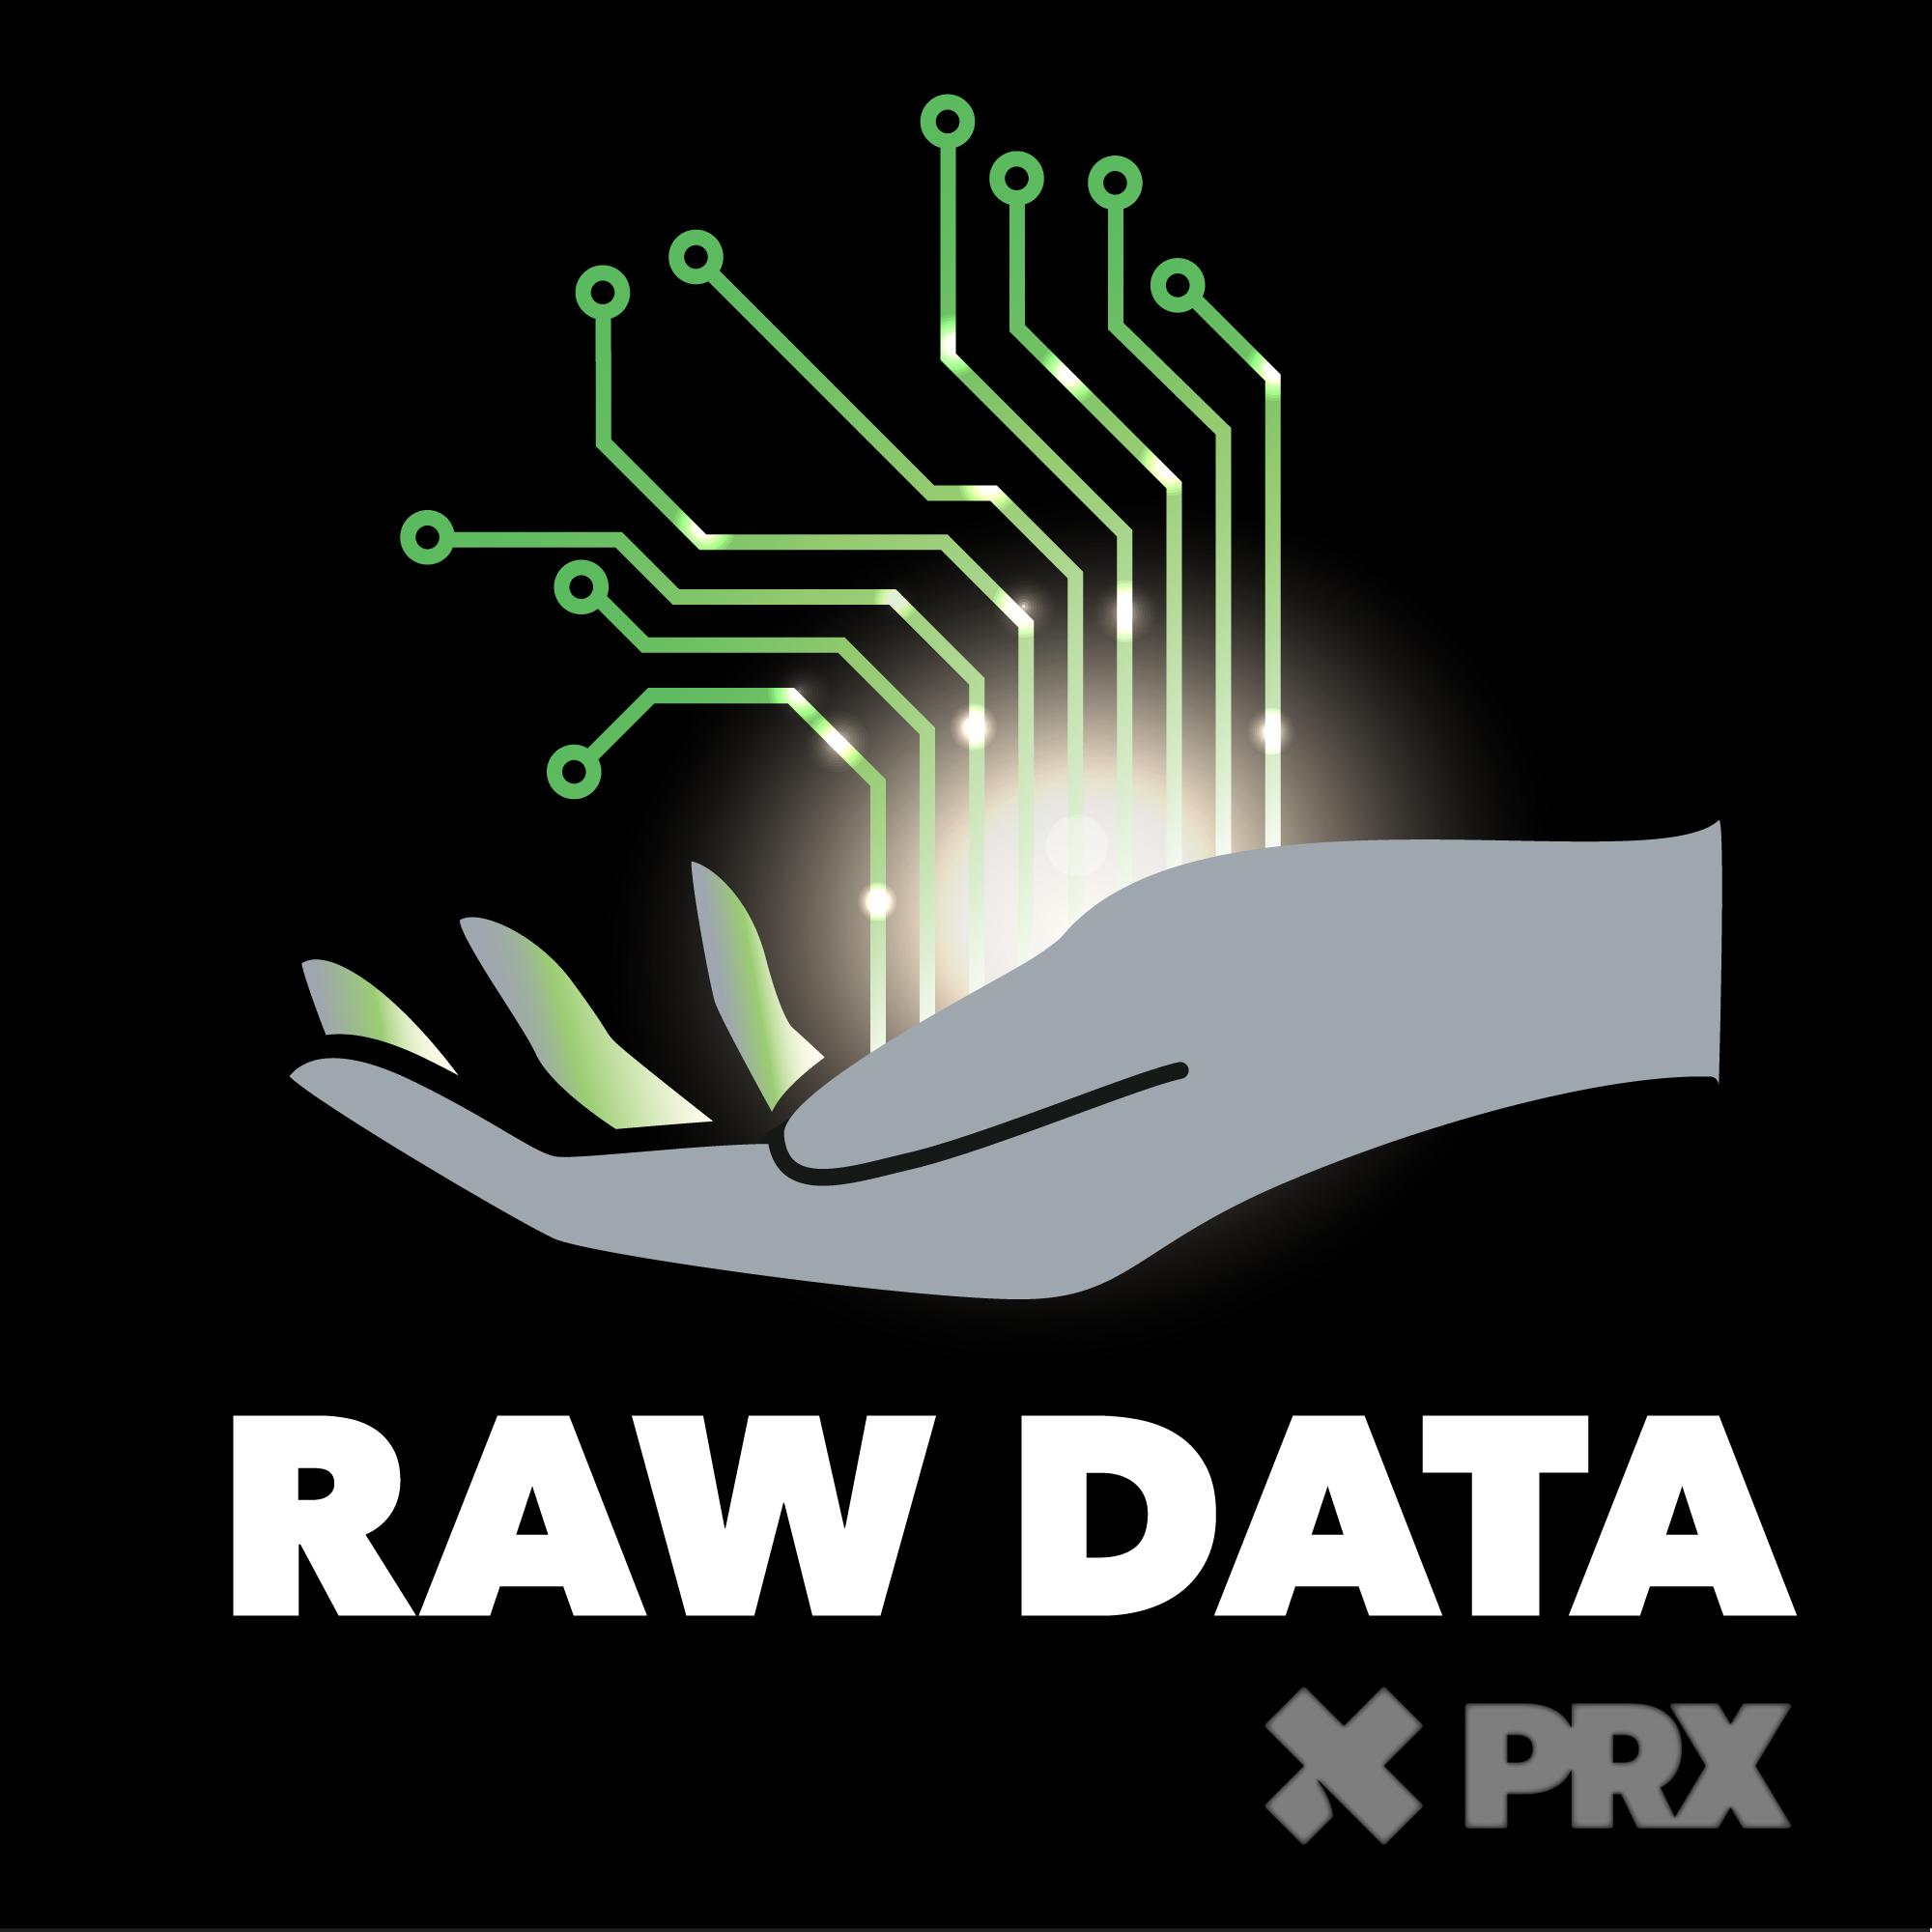 Rawdata_forweb_rgb__1__small